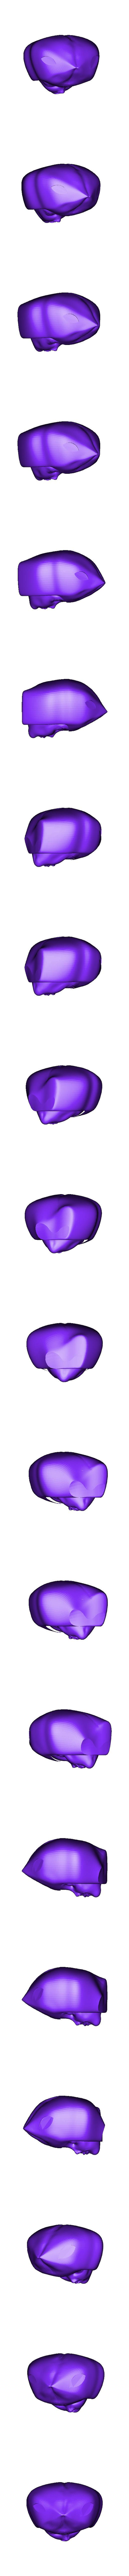 Head.stl Download STL file Super Witch • 3D print template, amadorcin